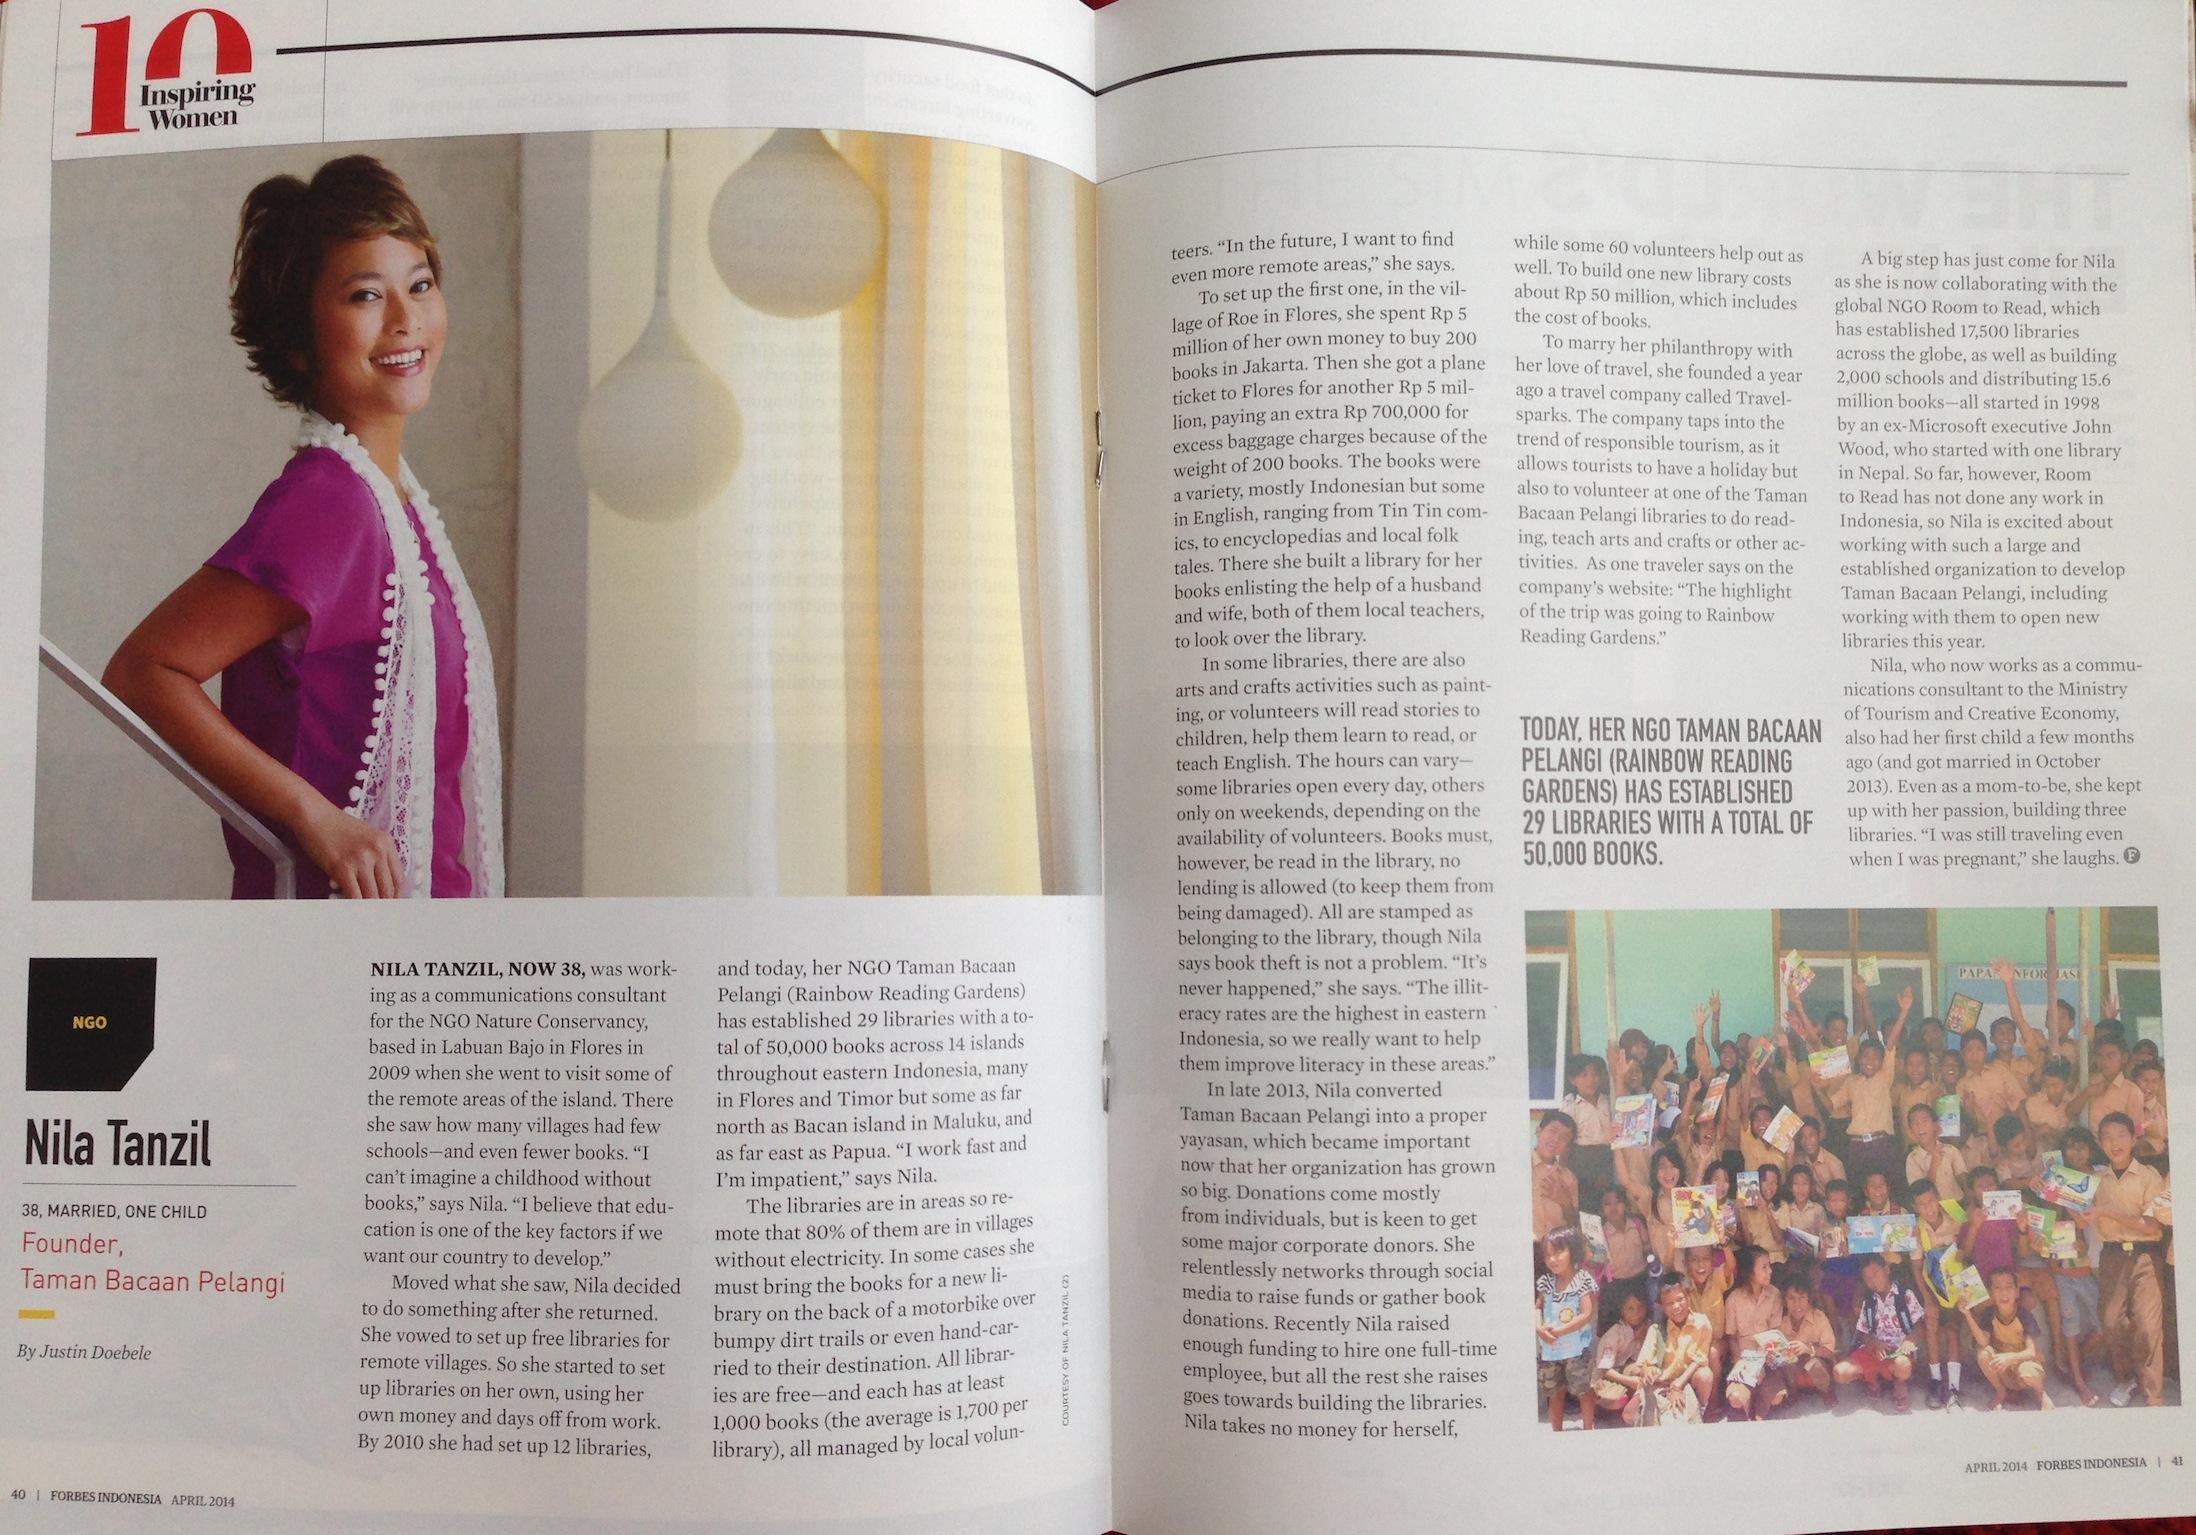 Forbes Indonesia's 10 Inspiring Women 2015. Nila Tanzil.